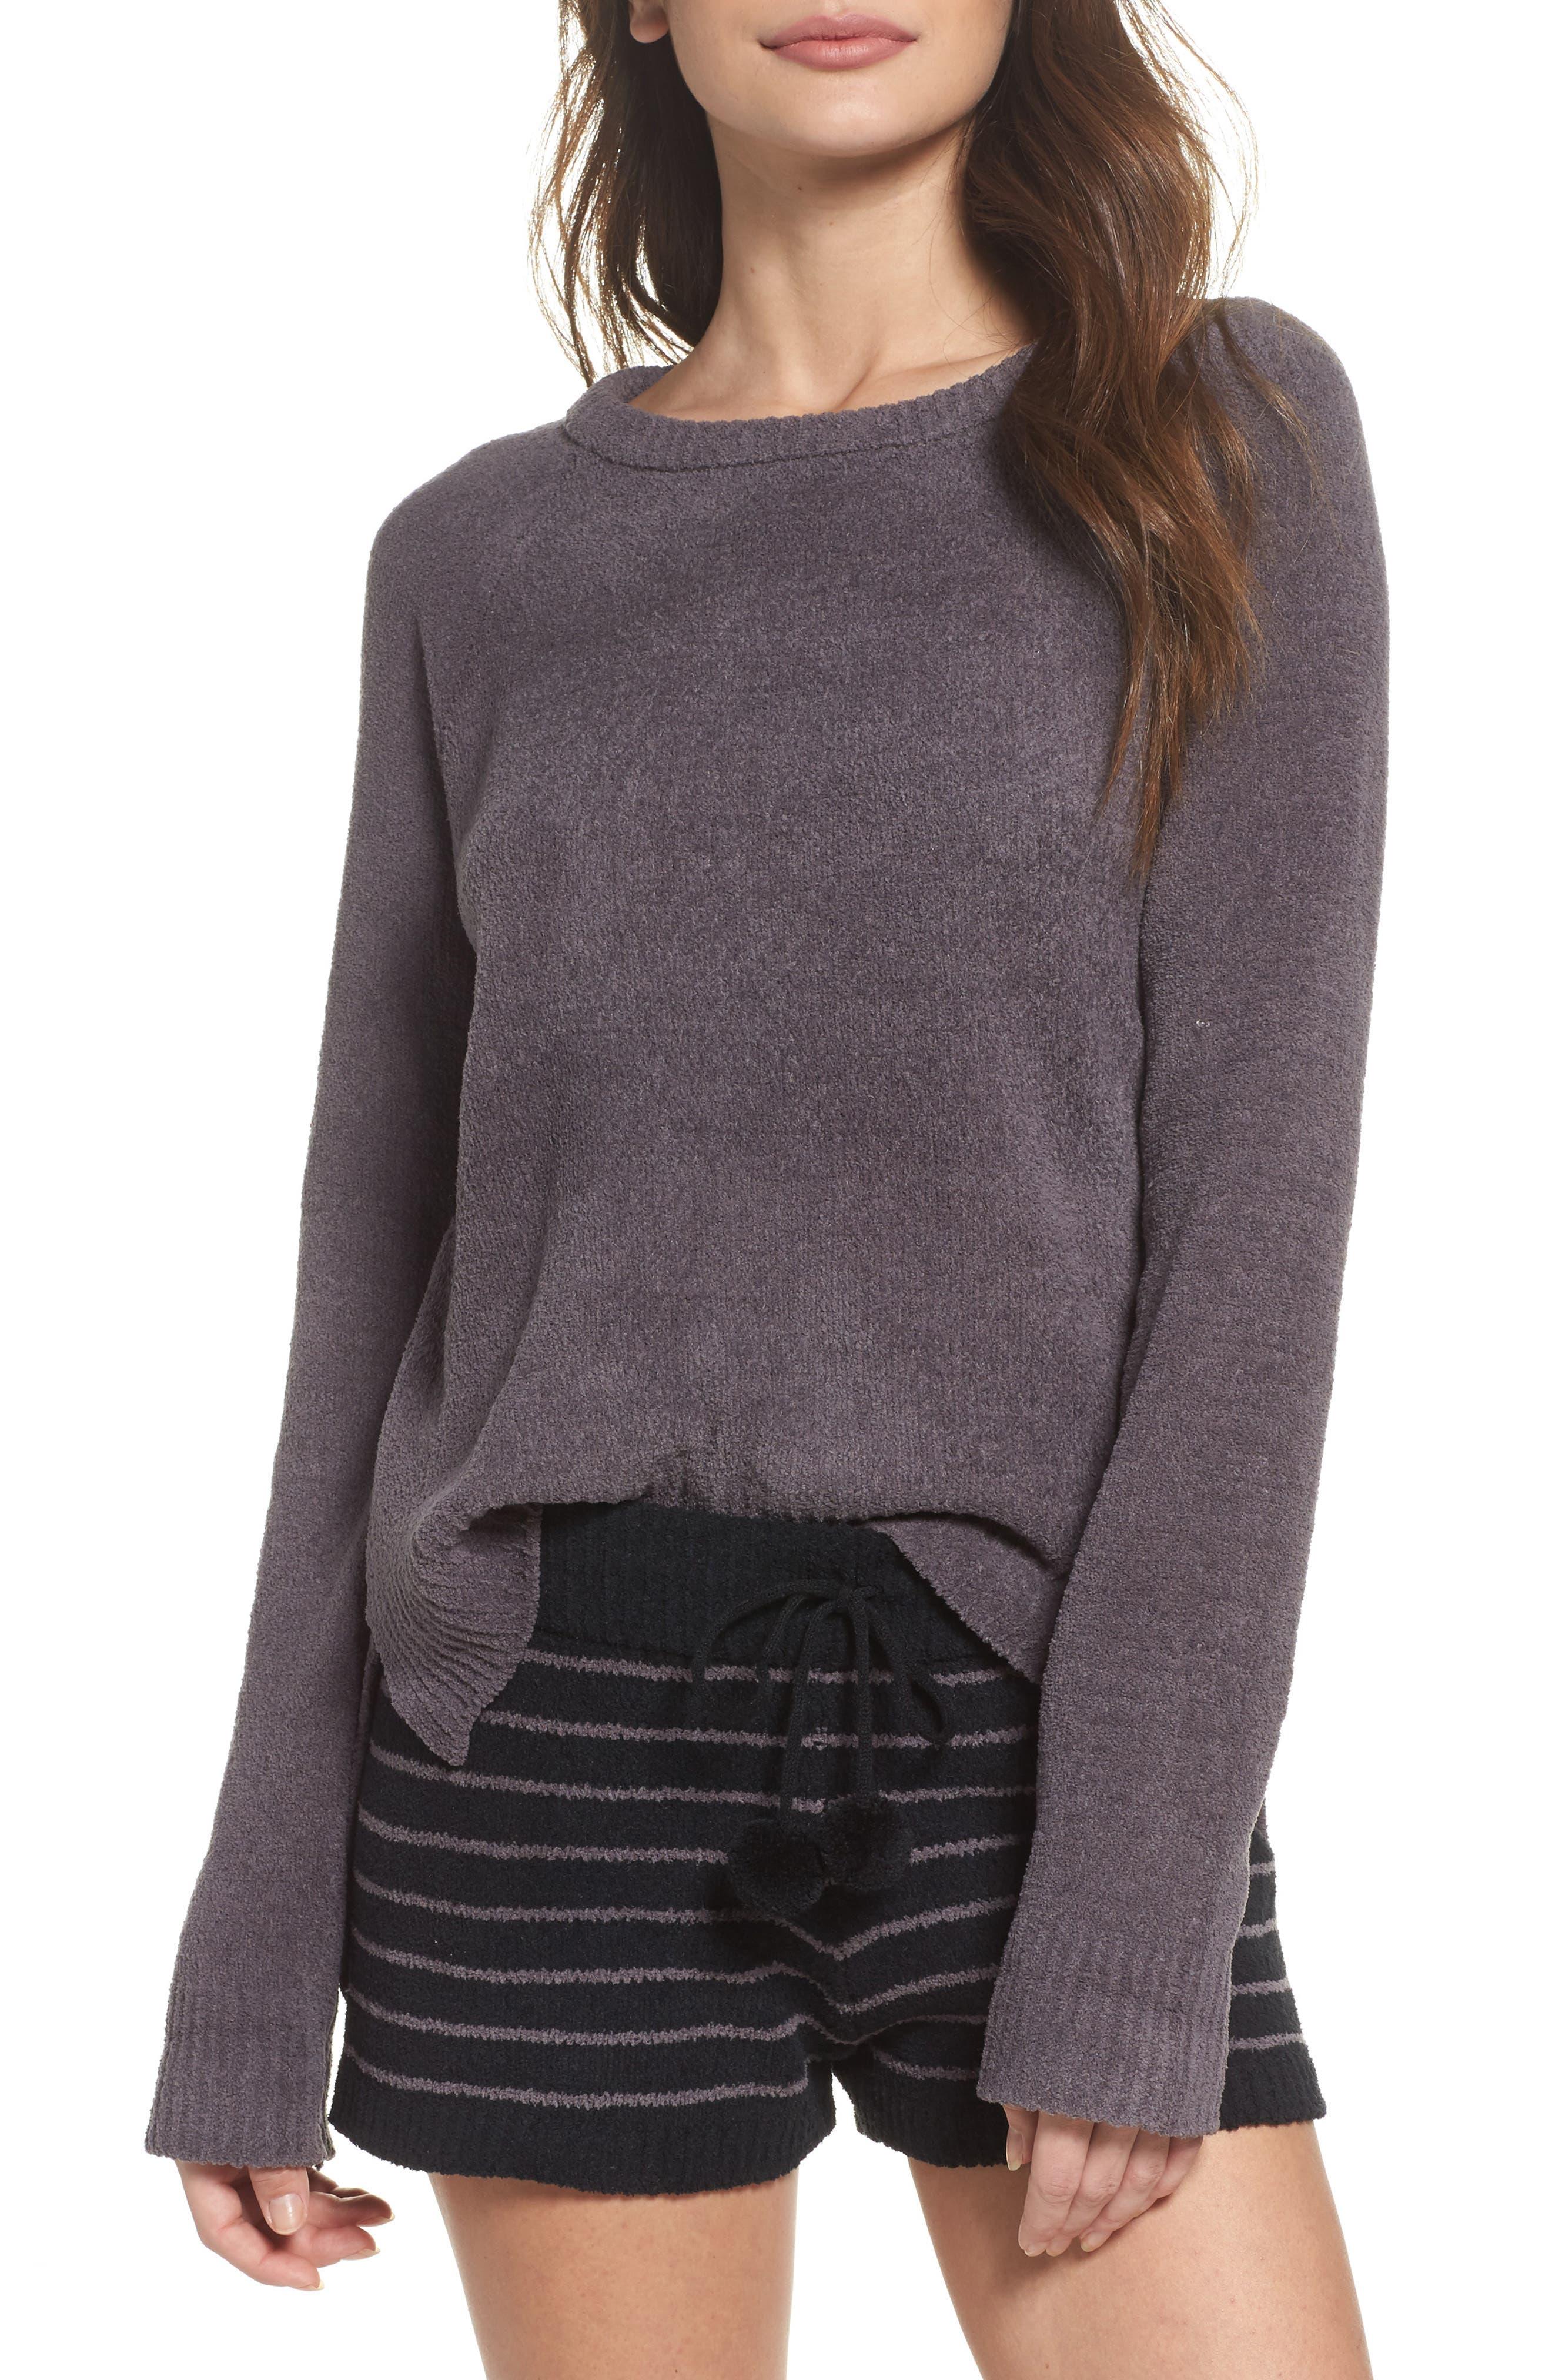 Marshmallow Sweatshirt,                             Alternate thumbnail 5, color,                             Charcoal